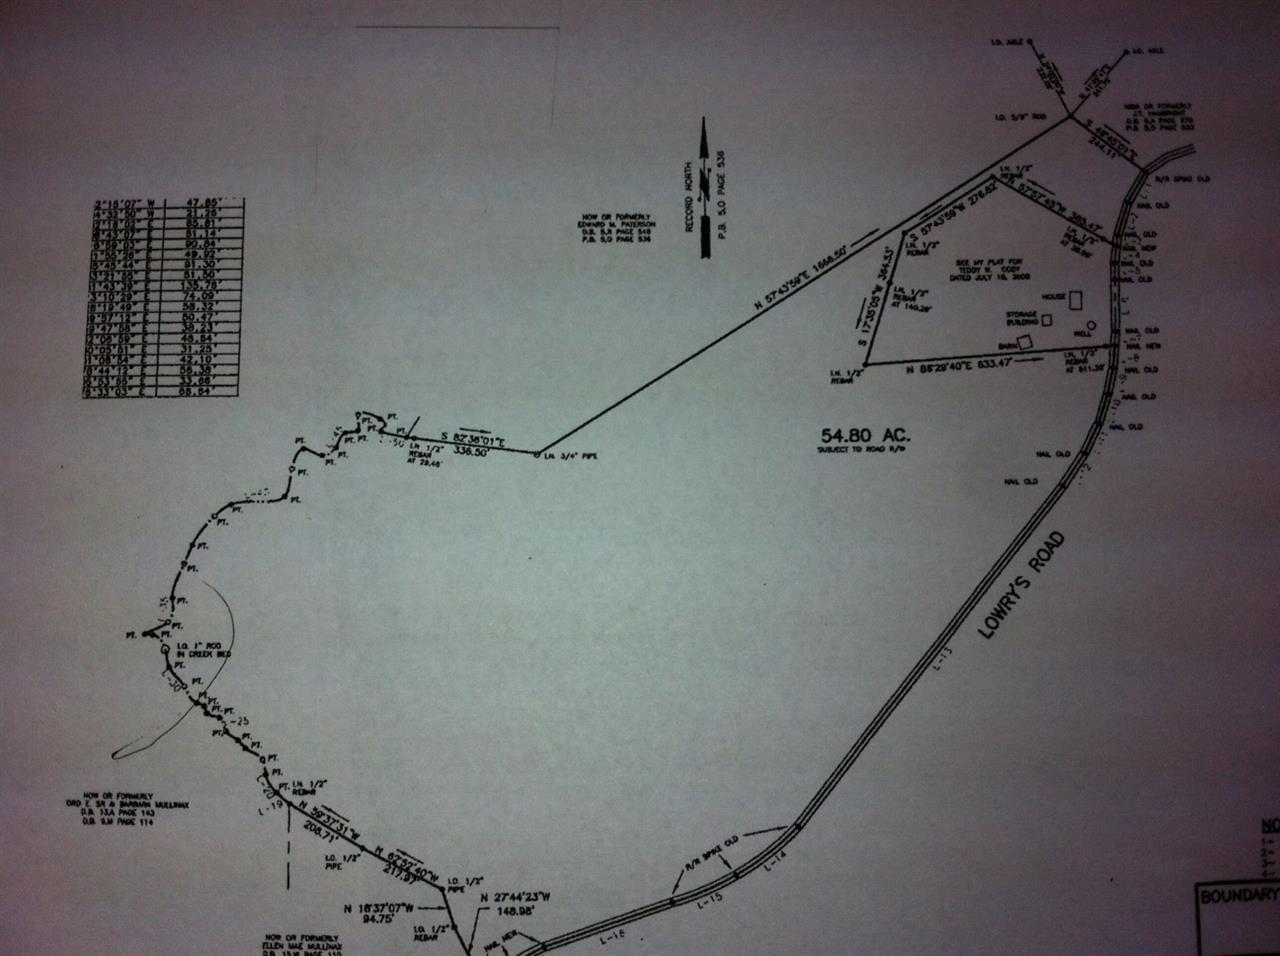 54.8 acres by Gaffney, South Carolina for sale